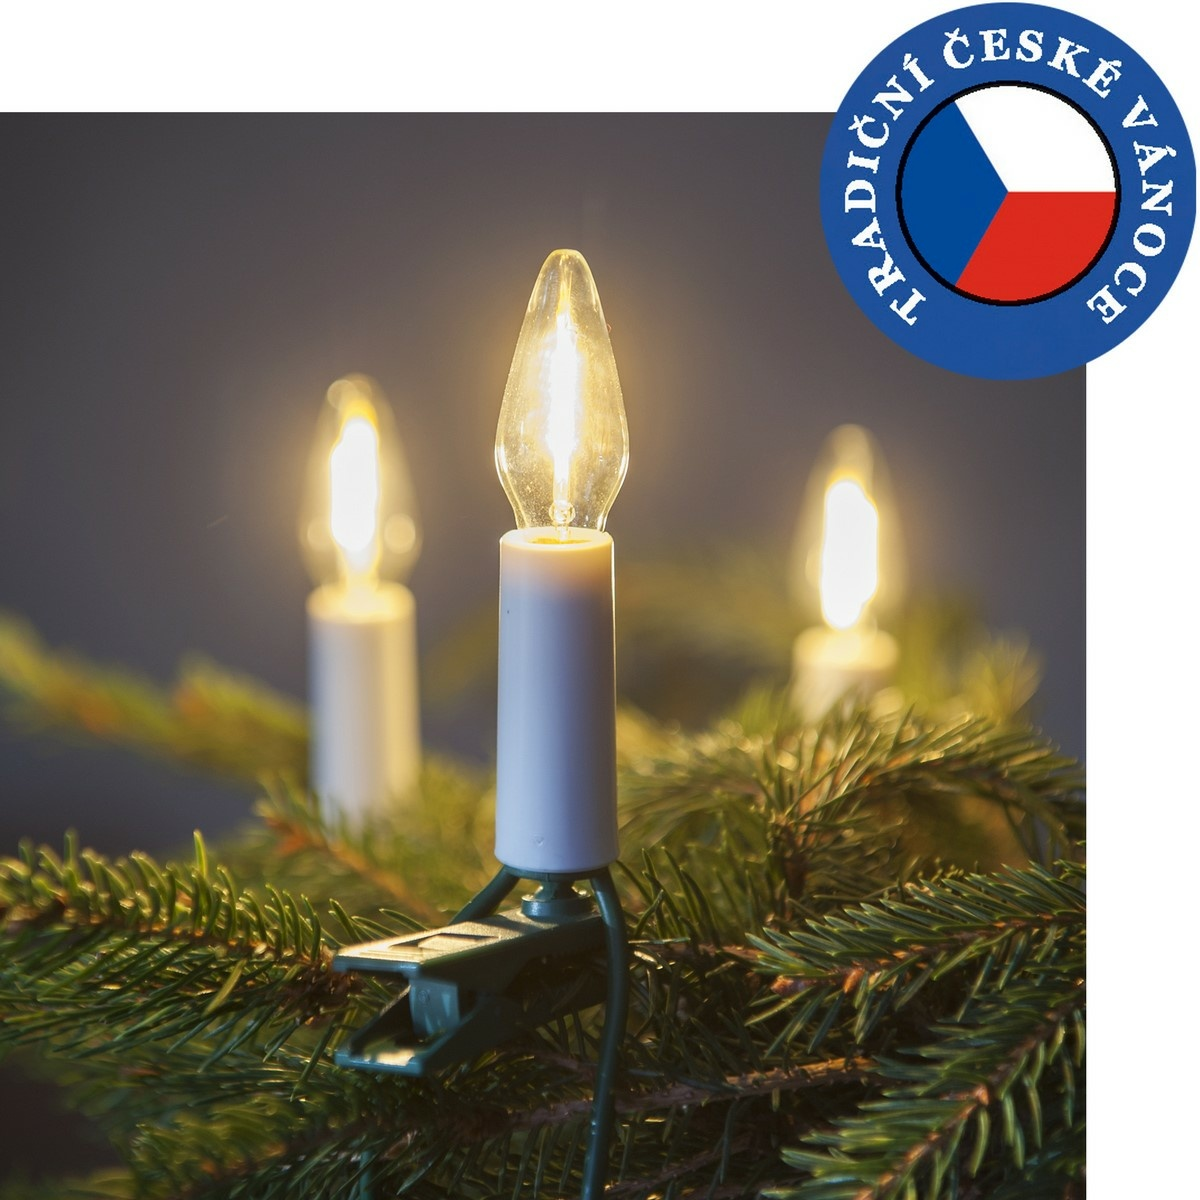 Produktové foto Souprava Felicia MONO LED Filament čirá SV-16, 16 žárovek